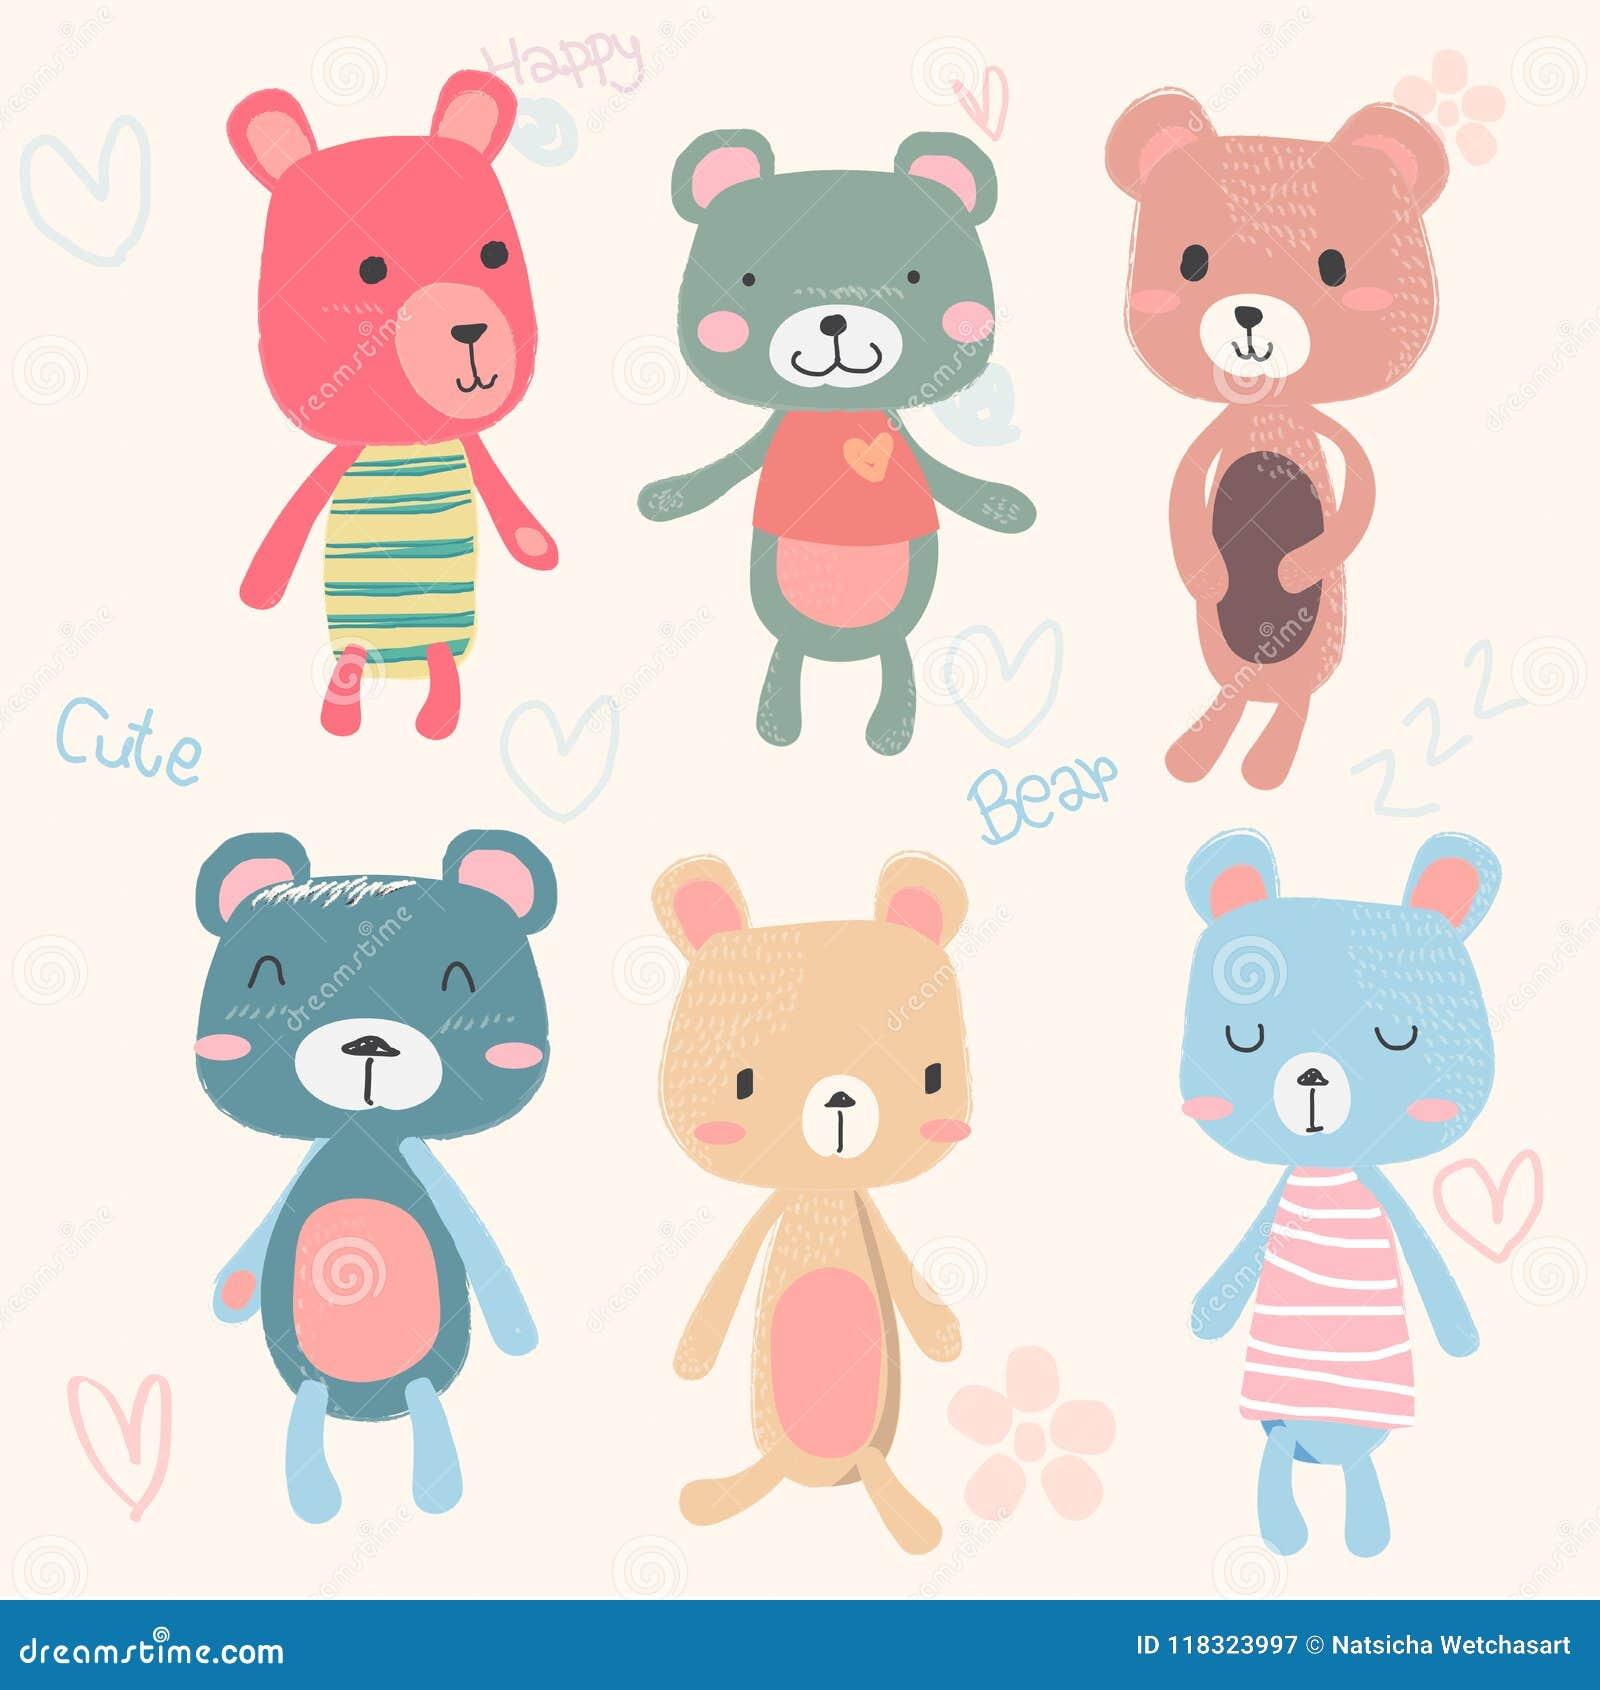 Vector Set Of Cute Teddy Bears Cartoon Character Hand Drawing In